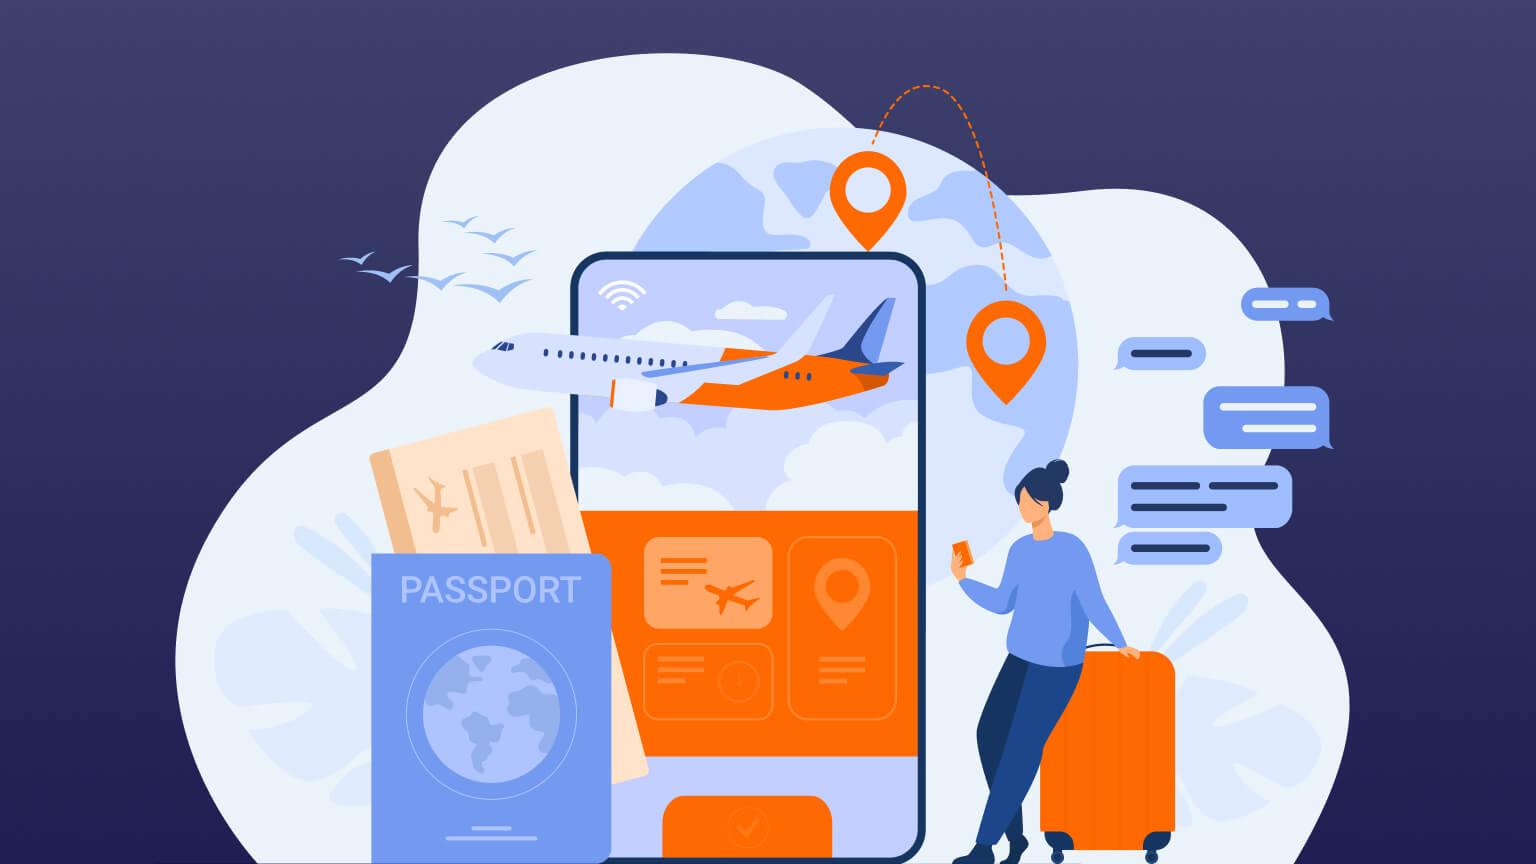 Person preparing for travel digitally